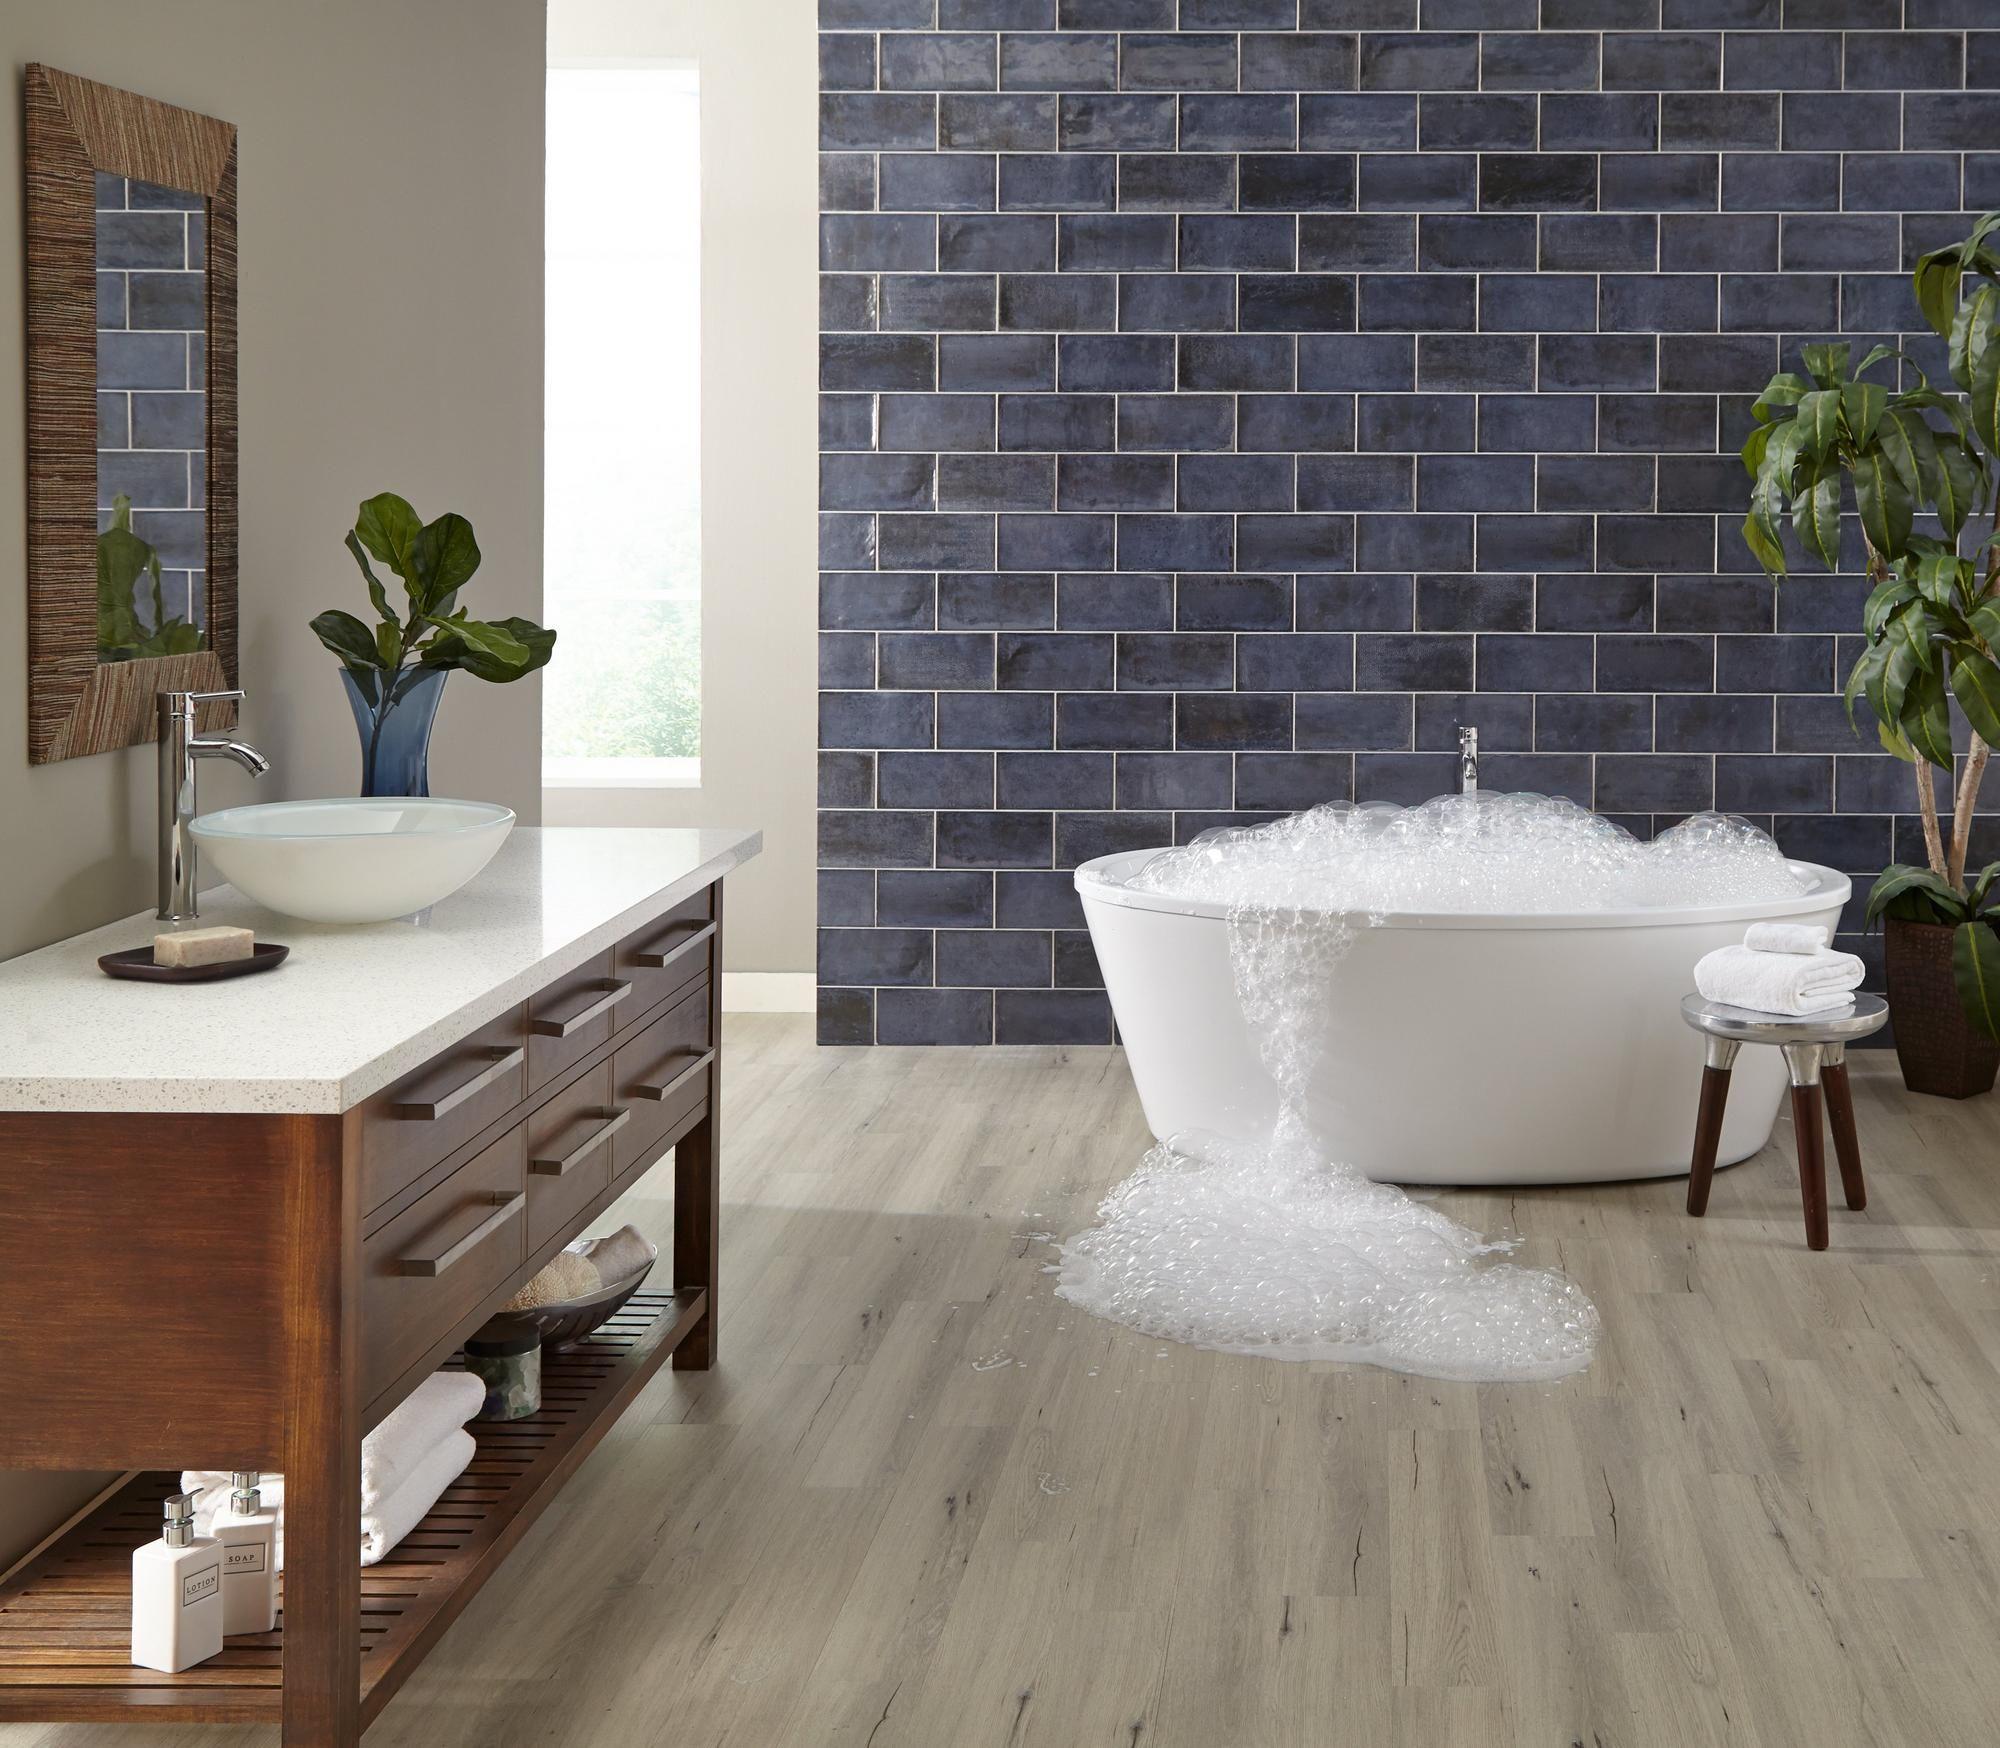 Esenzia Note Ceramic Tile Waterproof Flooring Best Bathroom Flooring Floor Decor